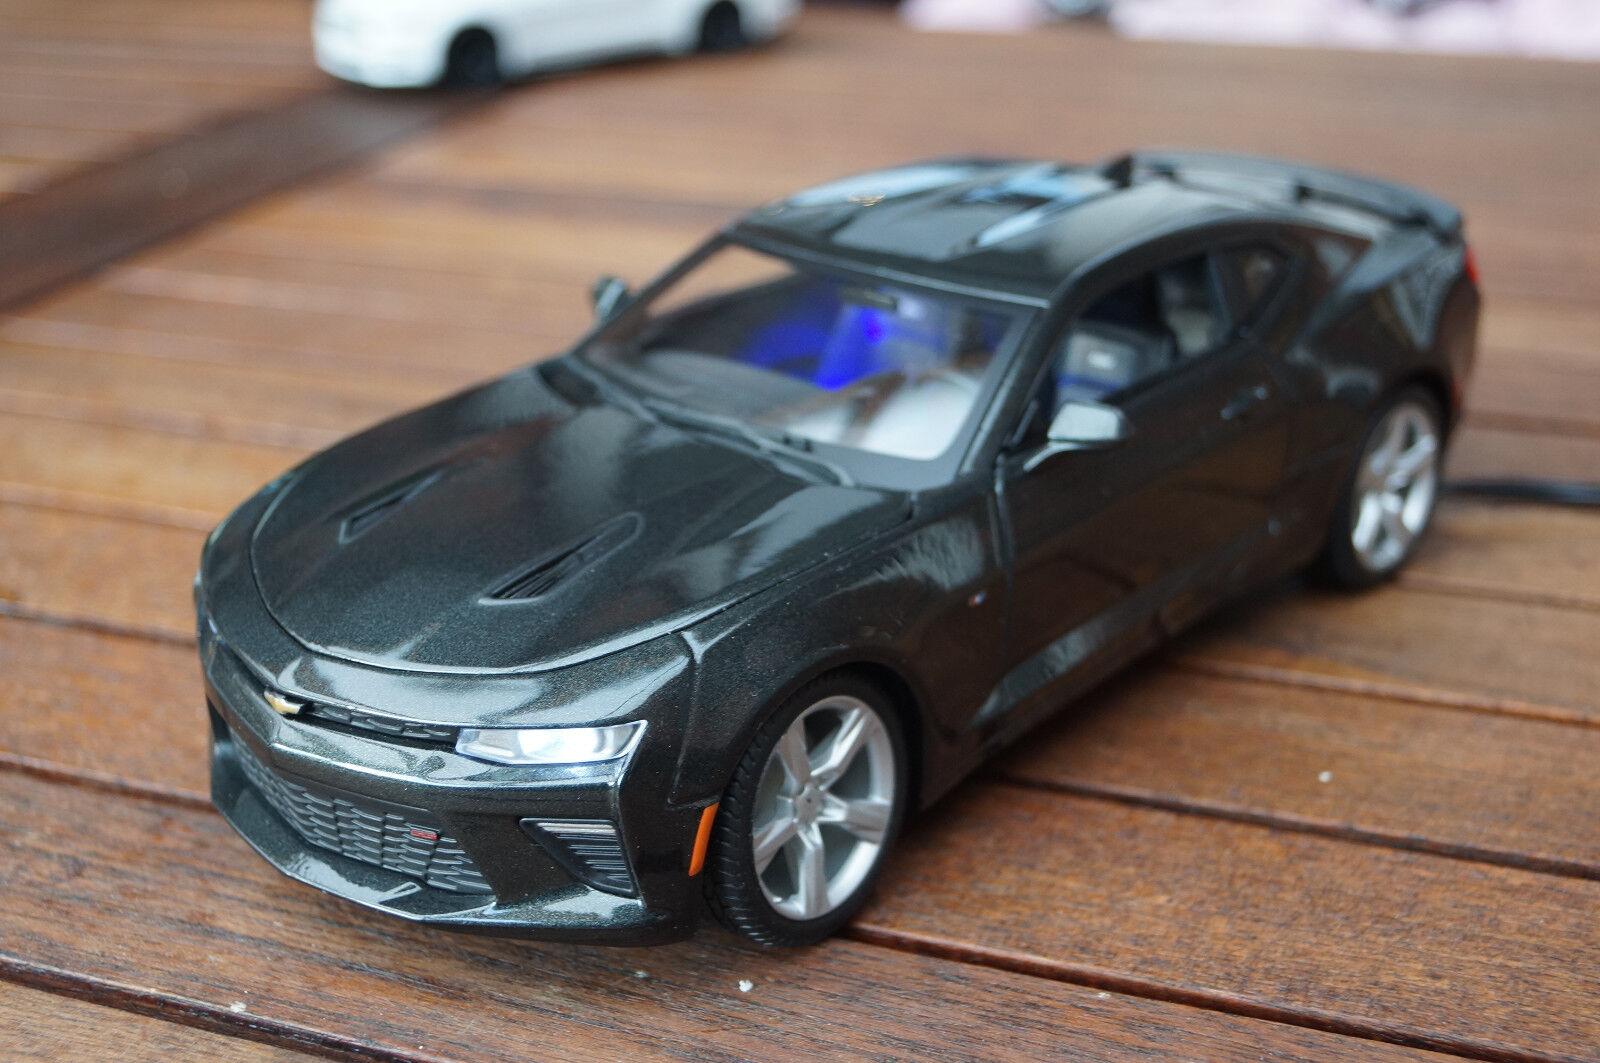 encuentra tu favorito aquí 2016 Chevrolet Camaro SS RS con iluminación LED (Xenon) (Xenon) (Xenon) 1 18 maisto gris  el precio más bajo